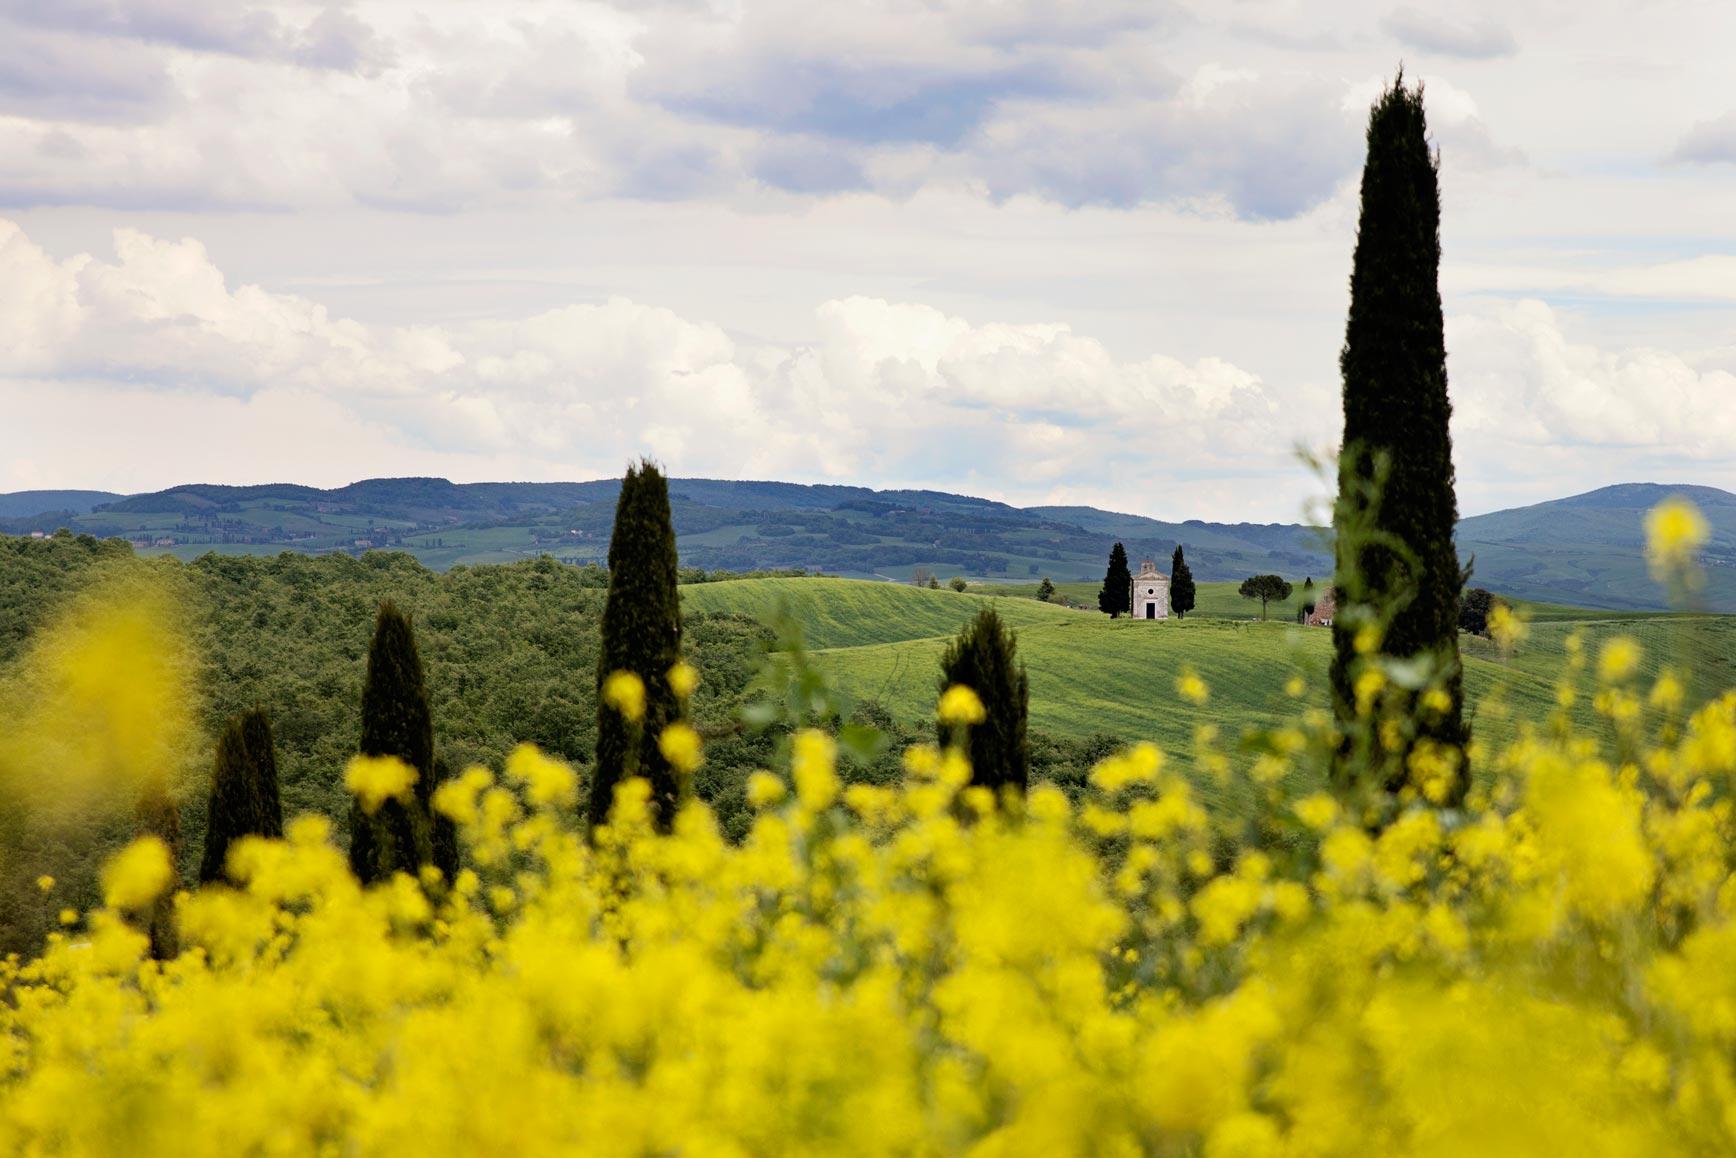 Campos de flores amarillas-claraBmartin-06